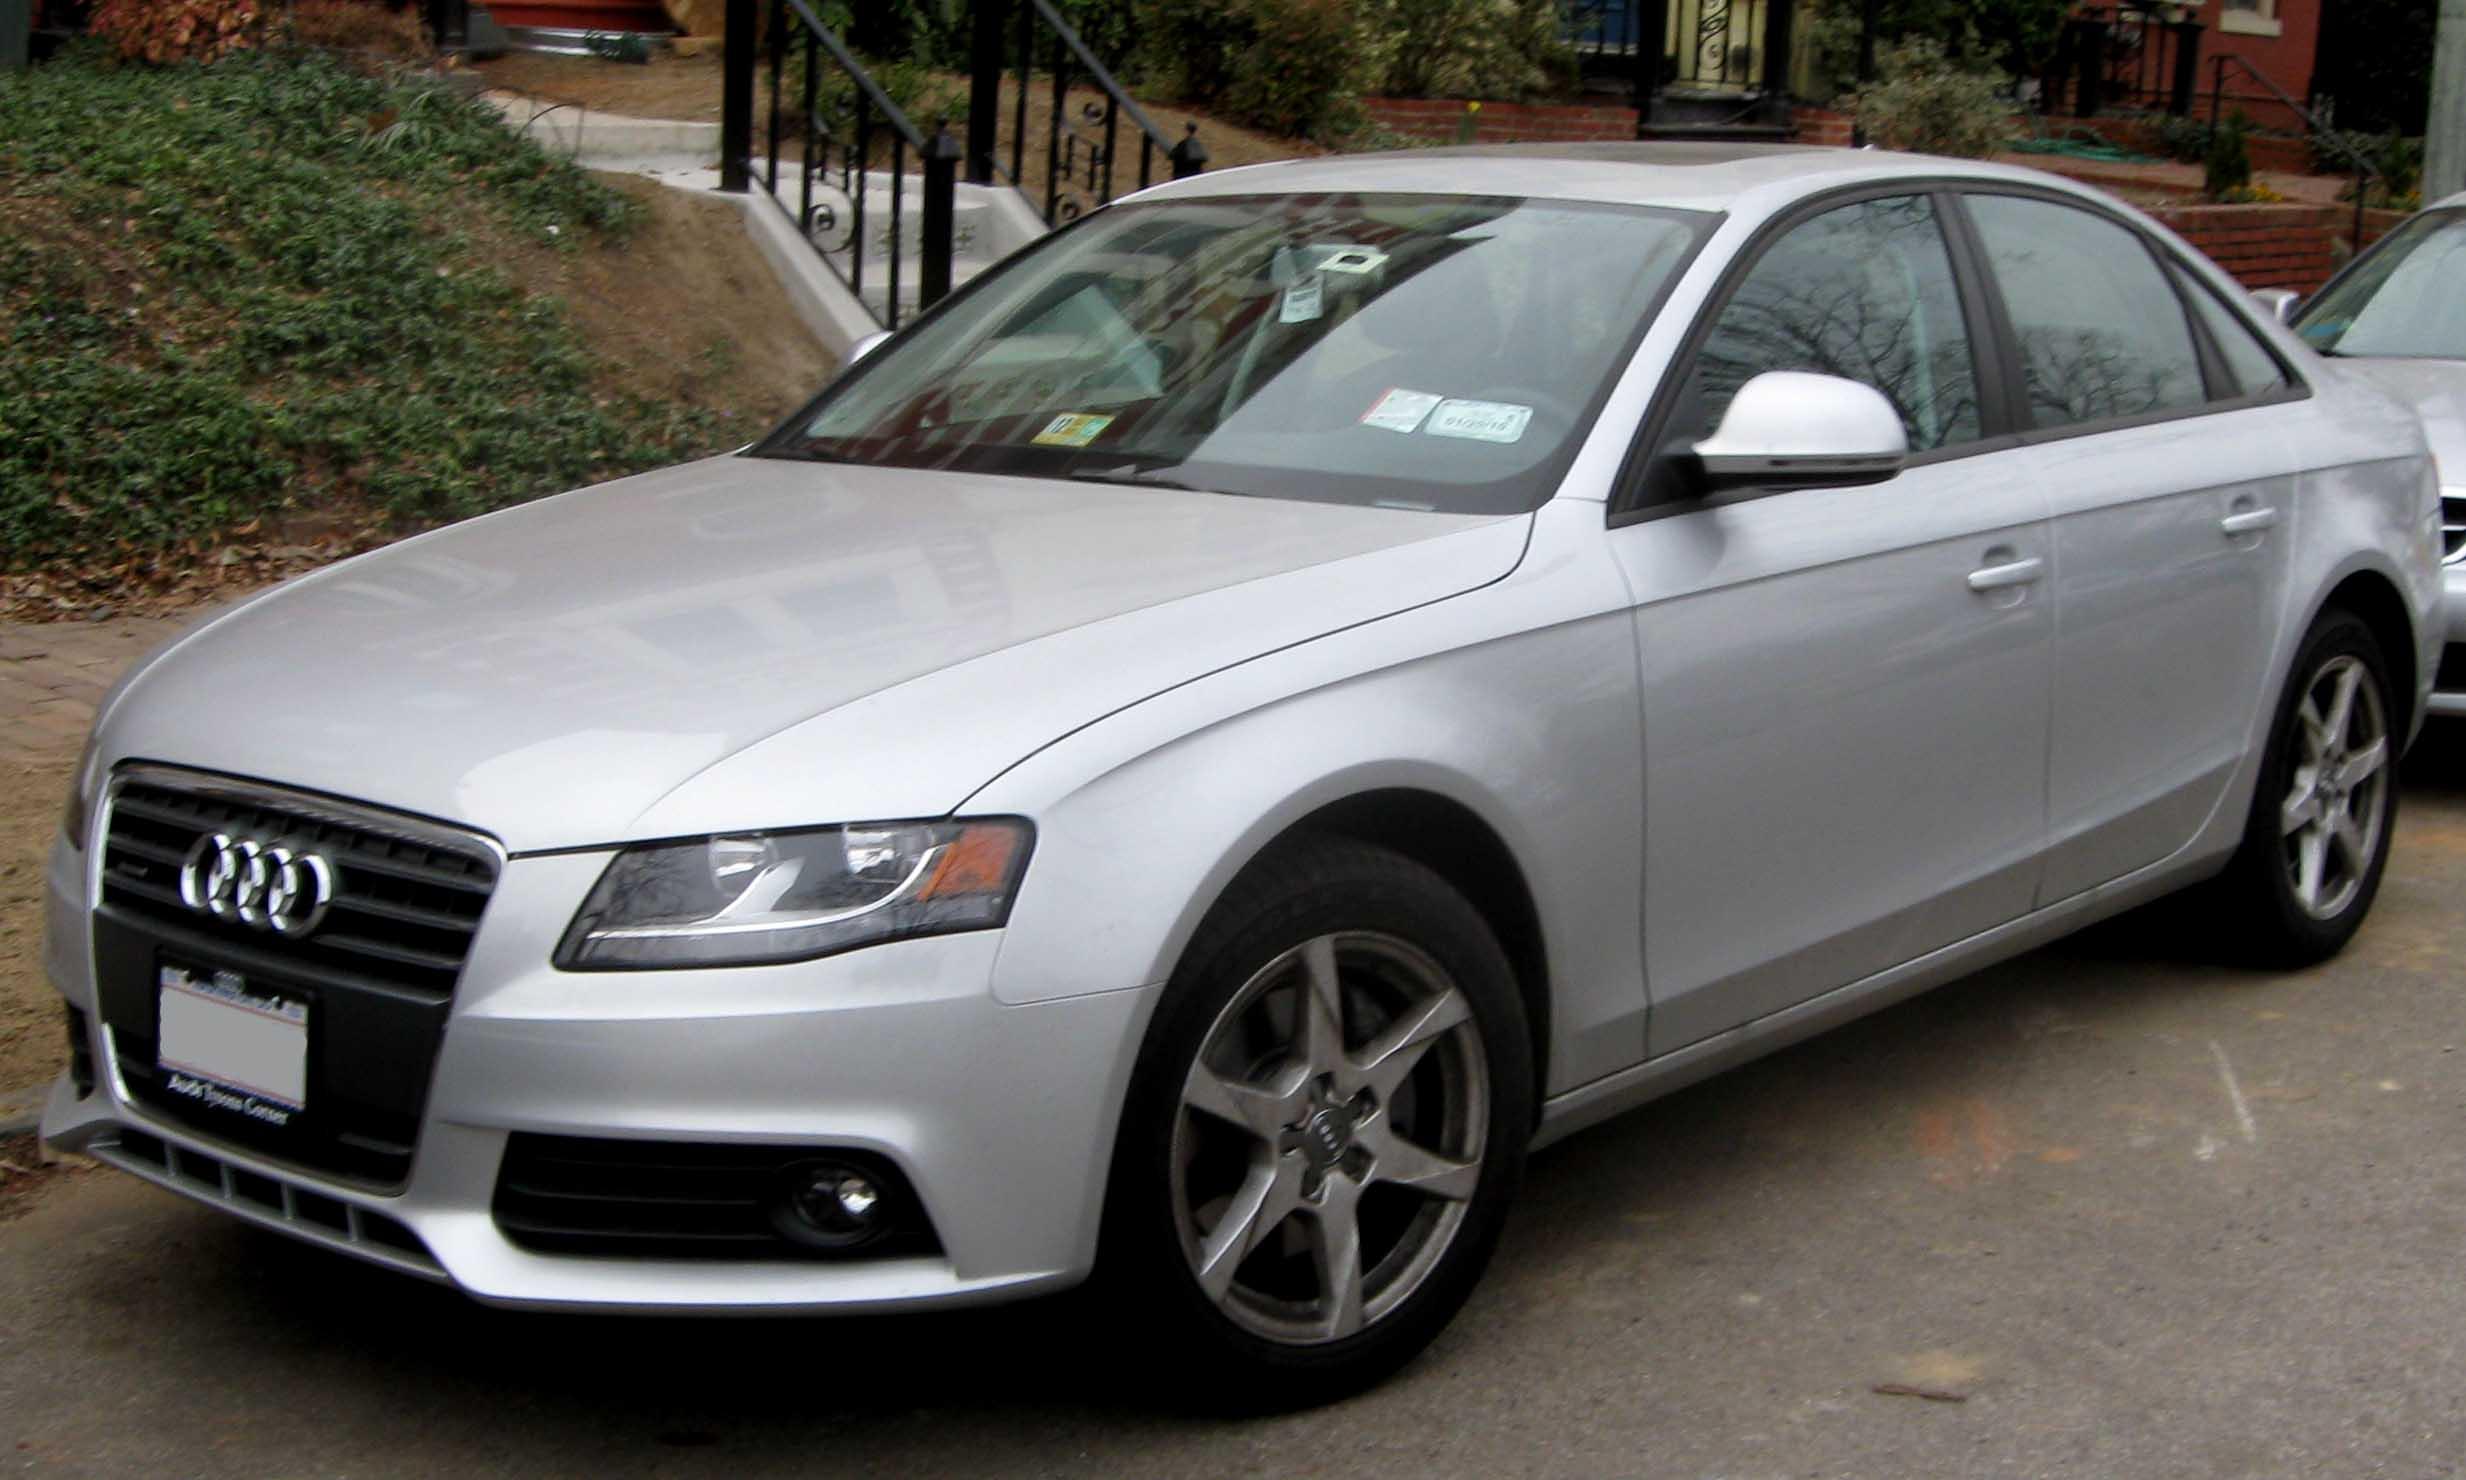 2009_Audi_A4.jpg